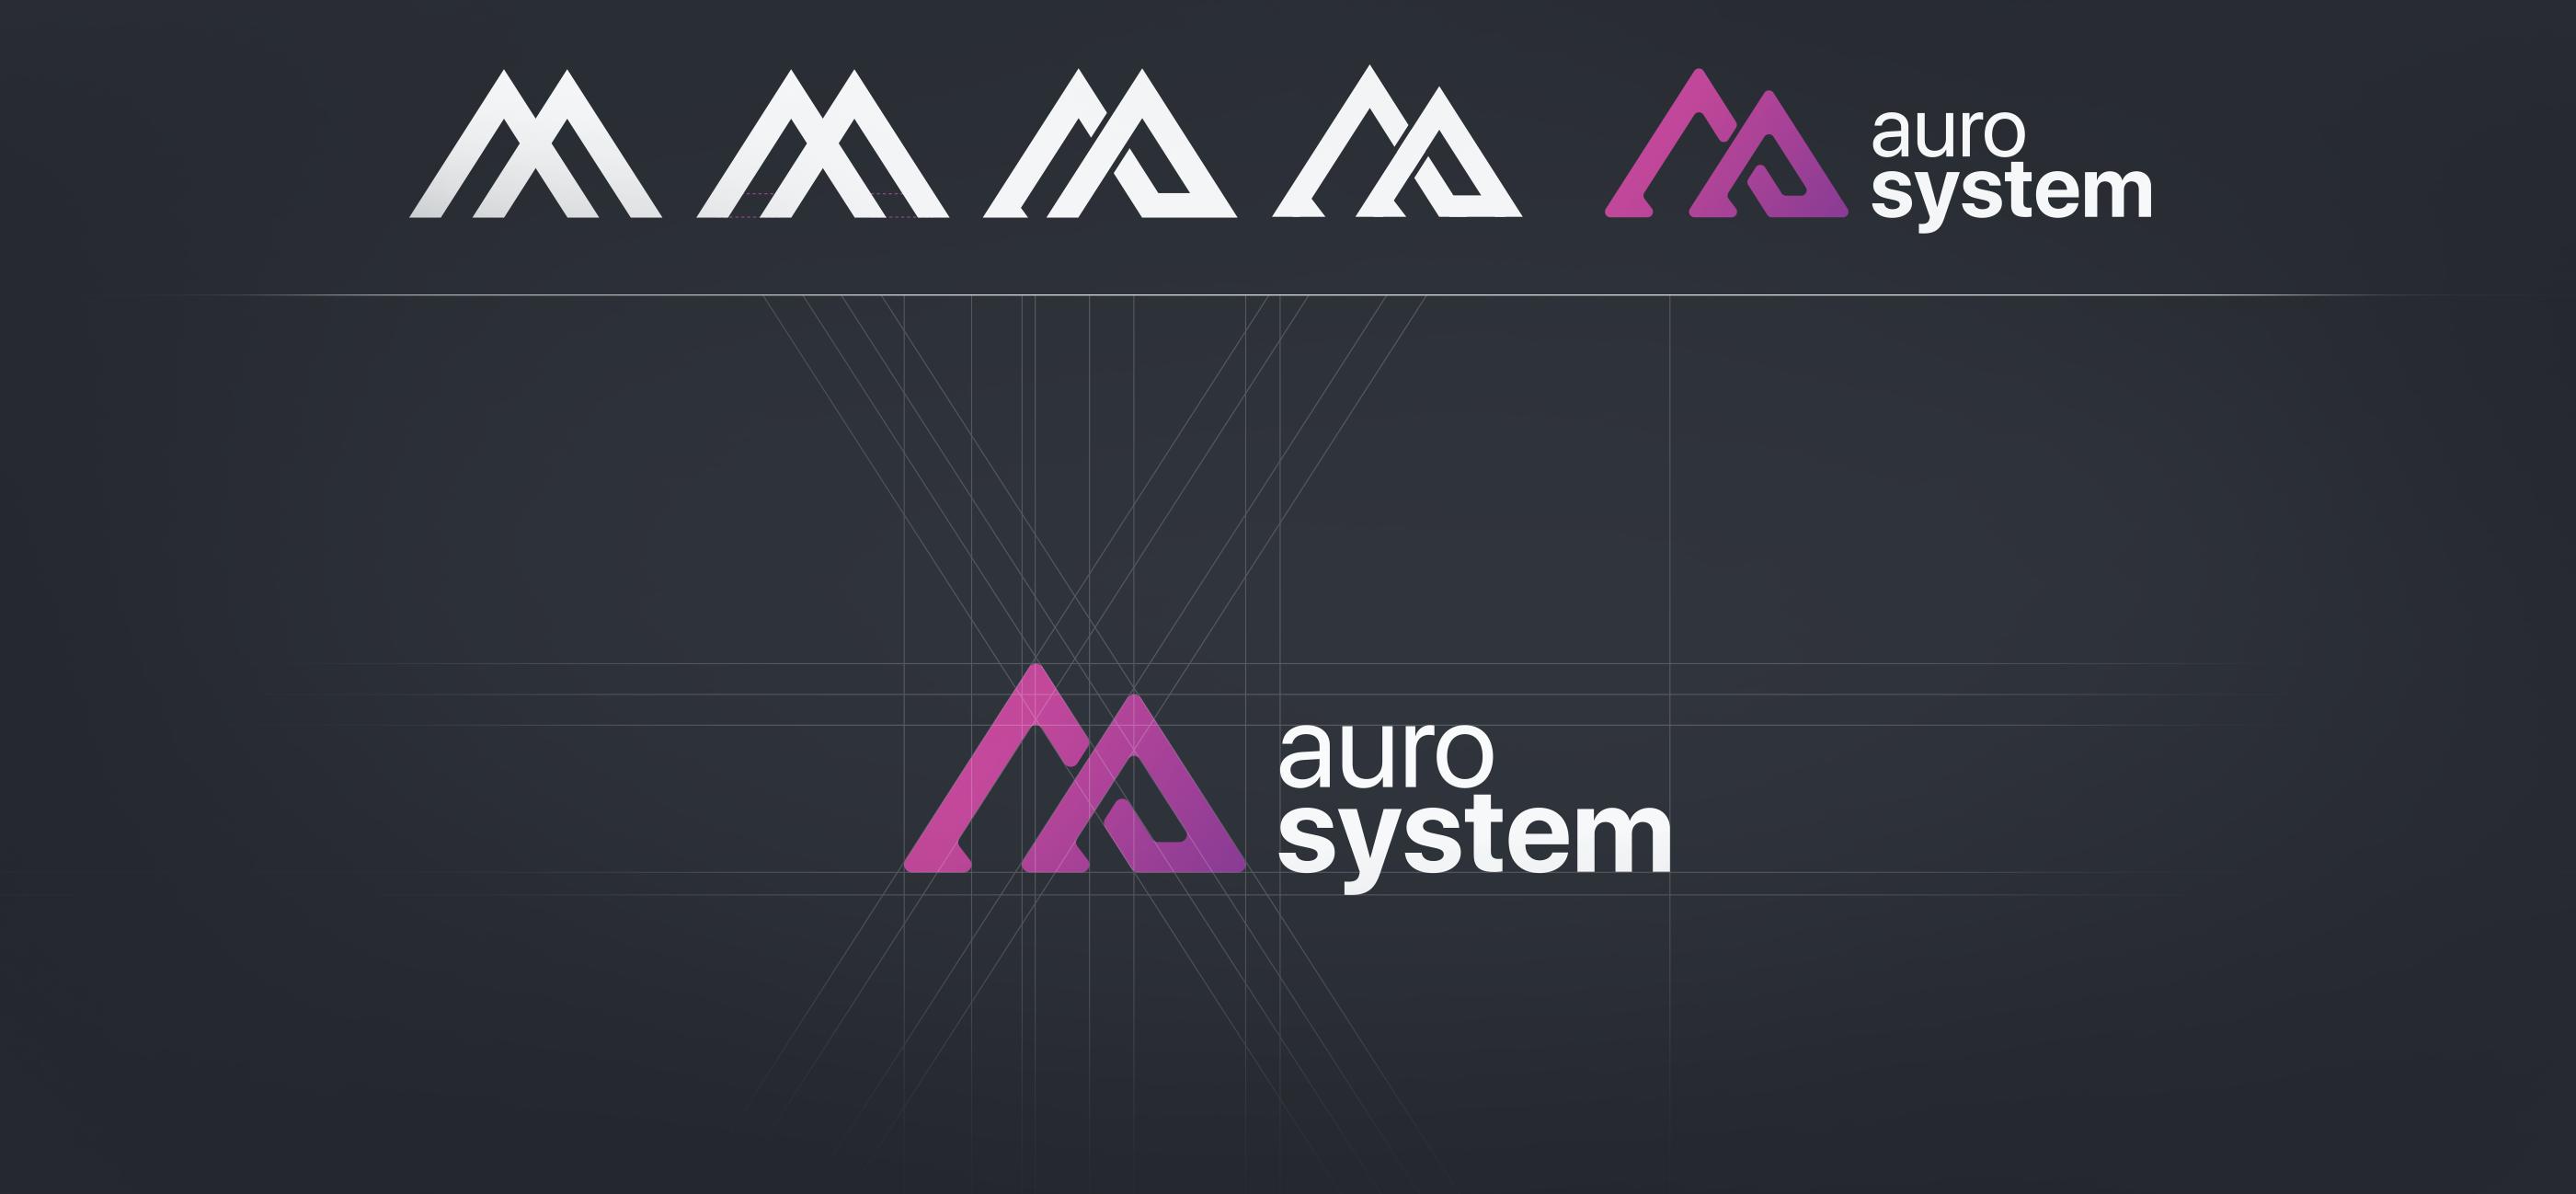 Aurosystem Branding & Logo design yerevan armenia